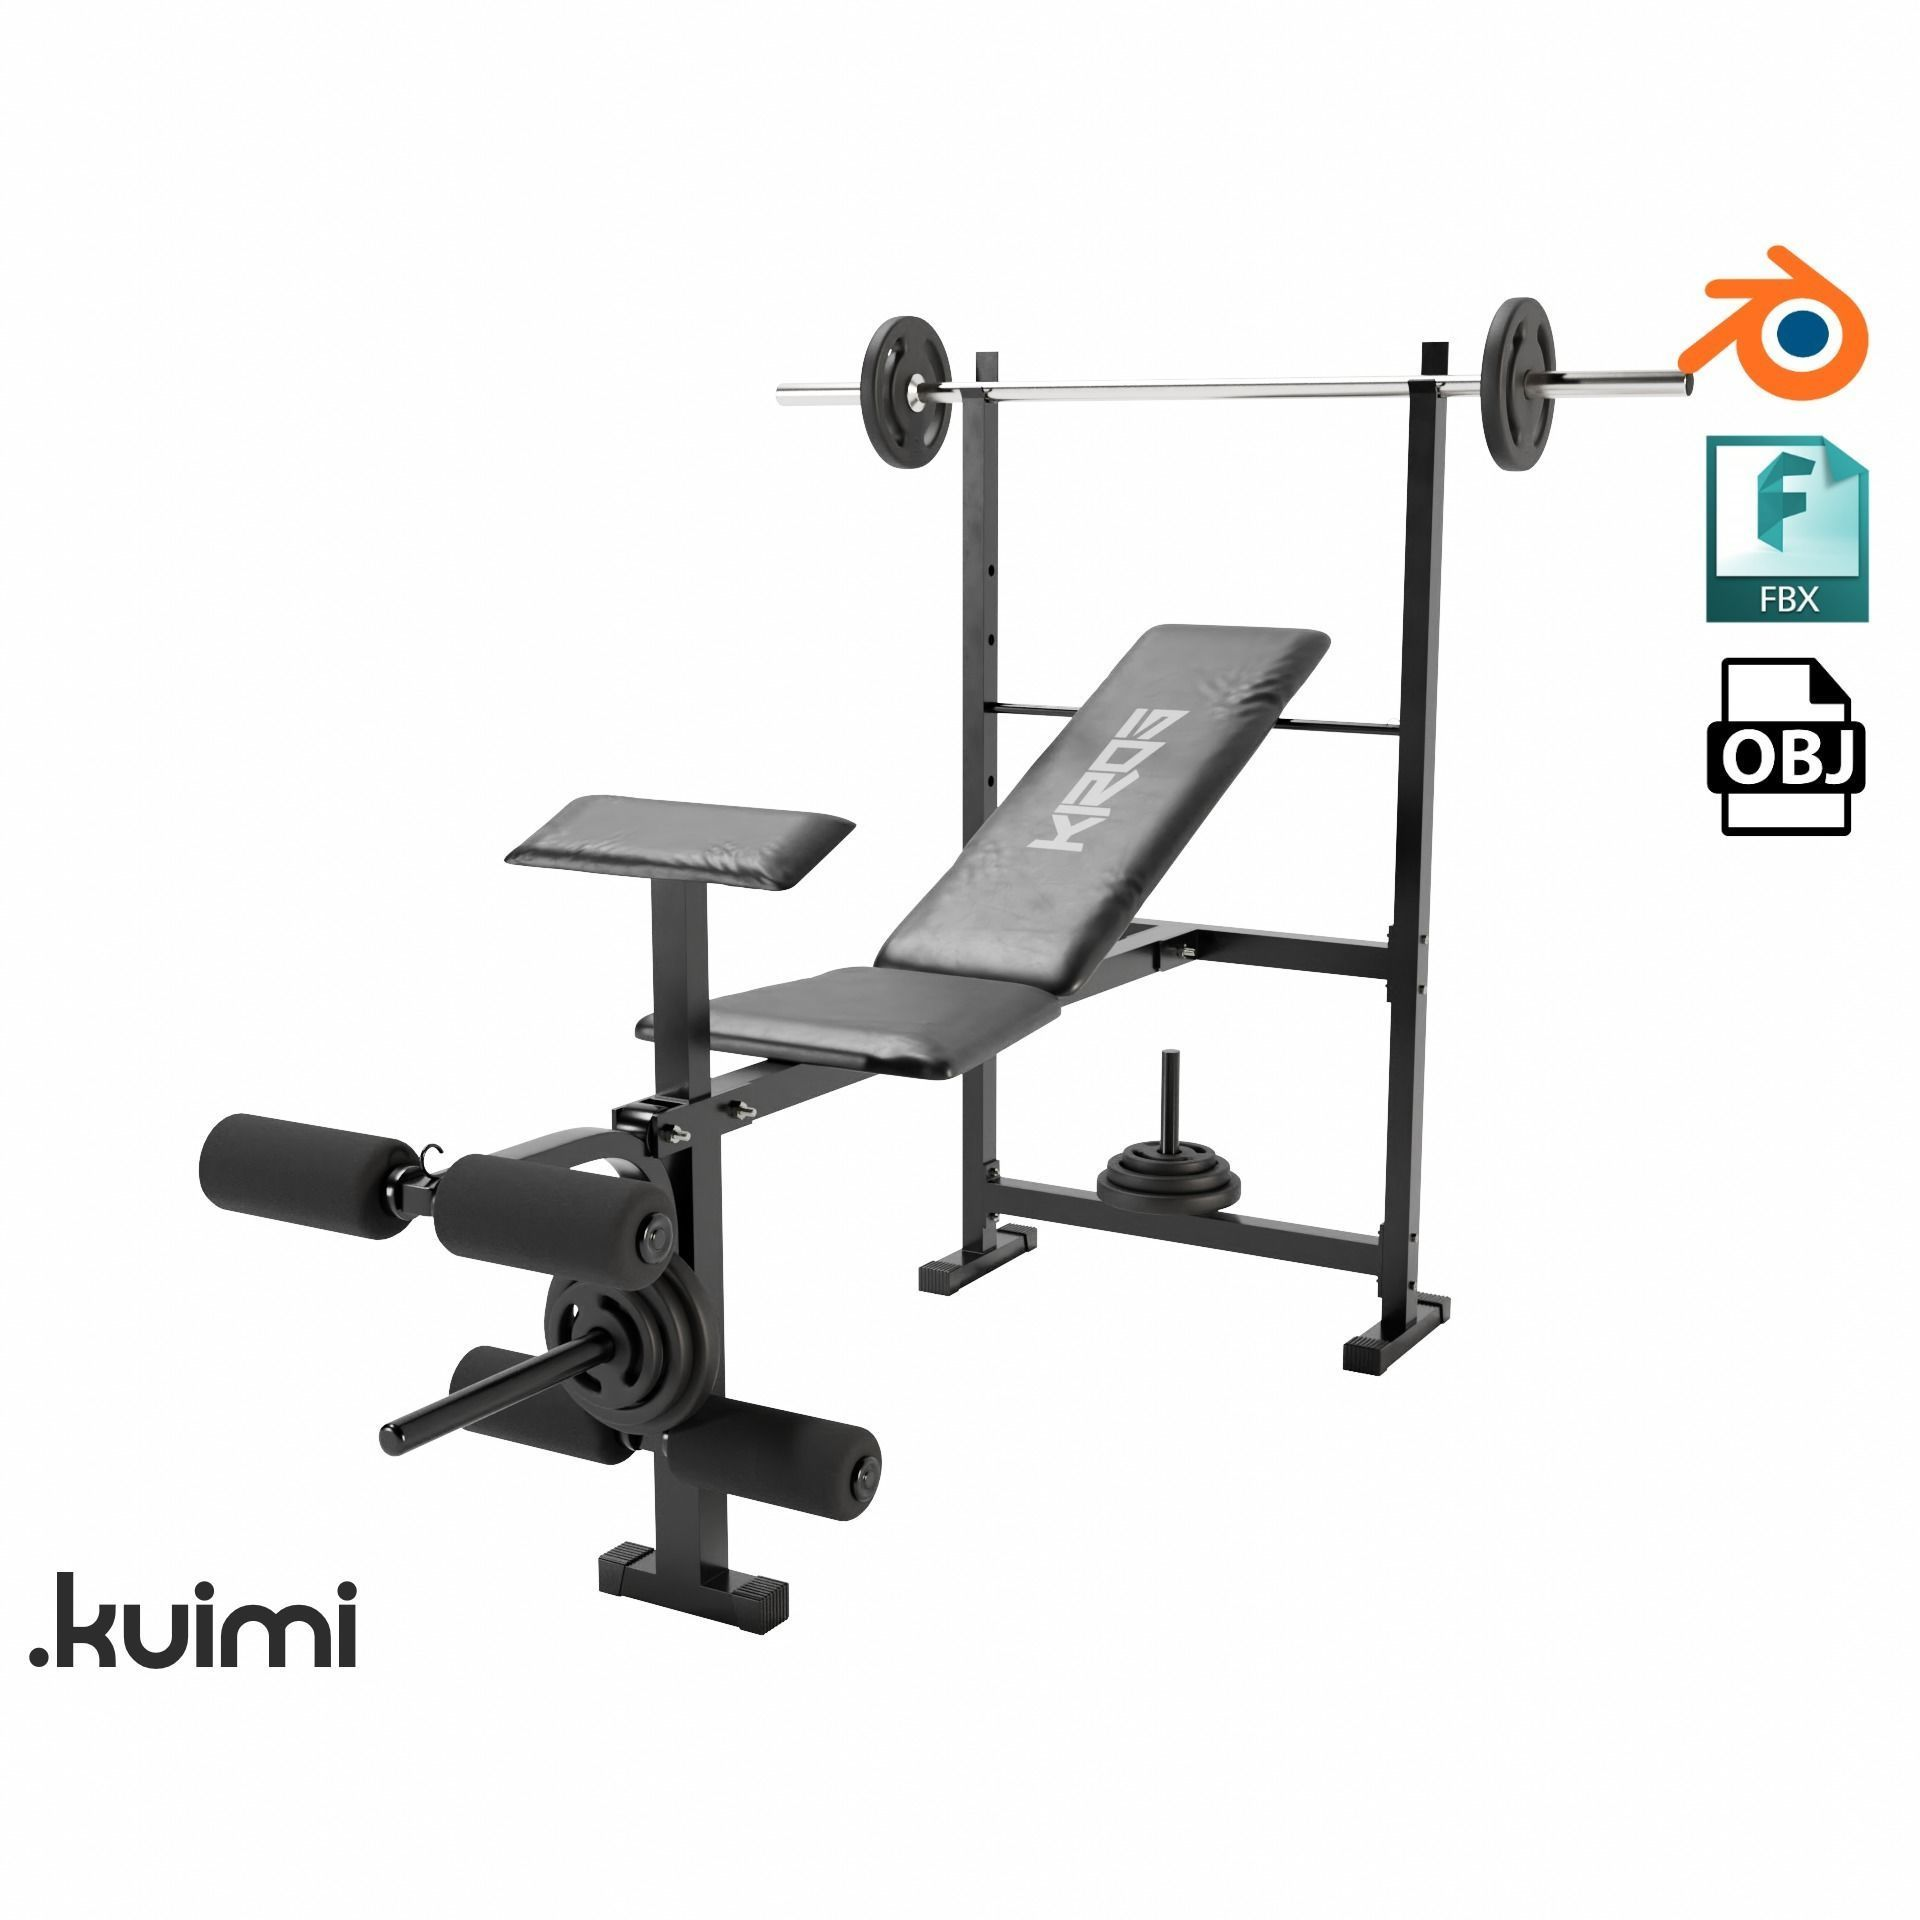 Gym Equipment 001